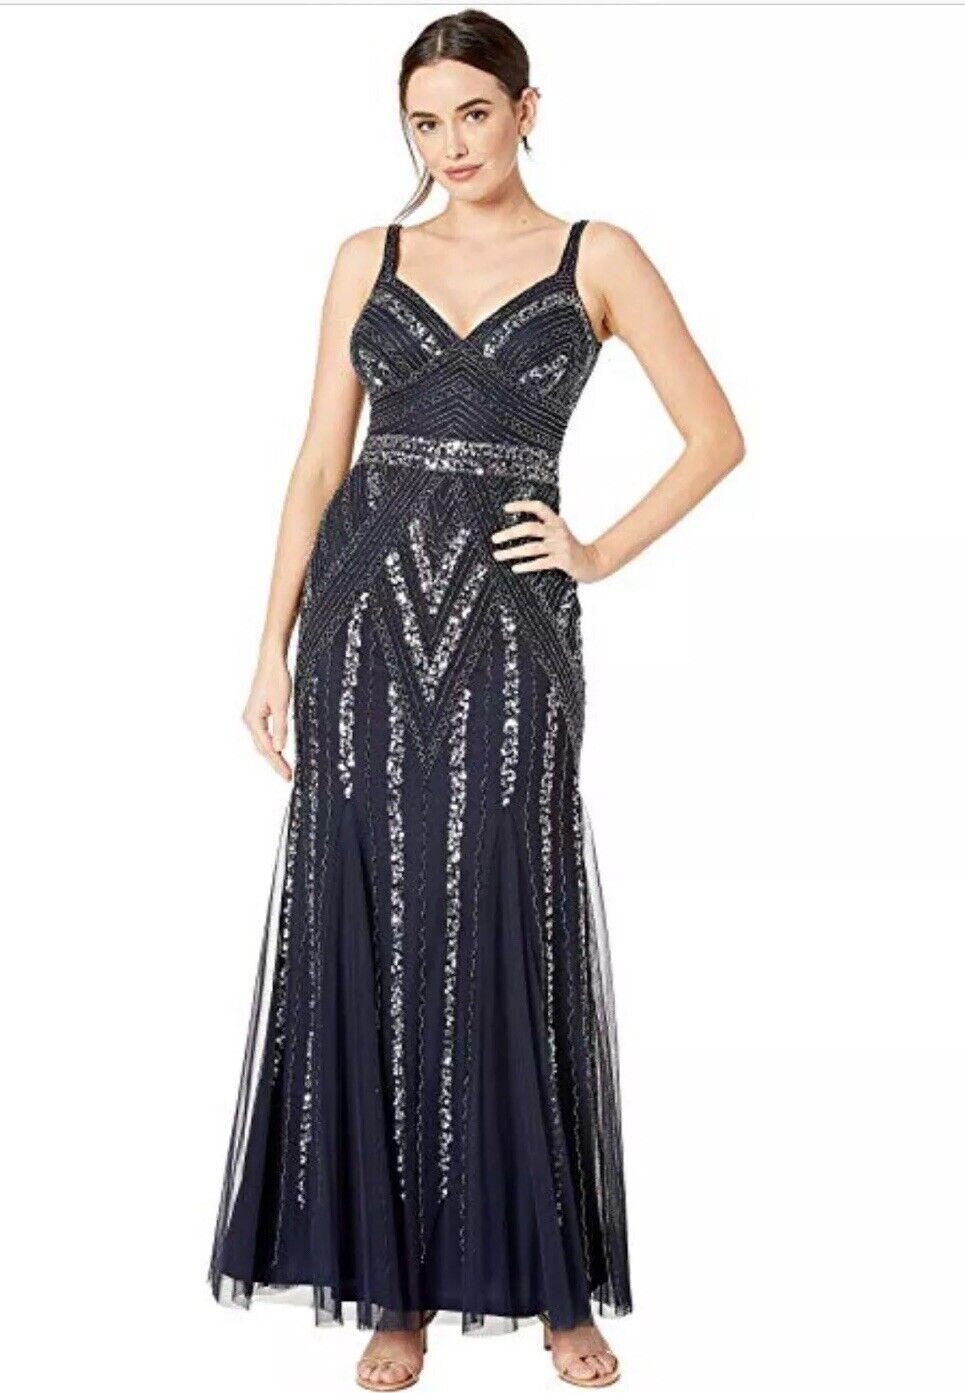 NWT Marina Navy Beaded Evening Gown - Größe 2